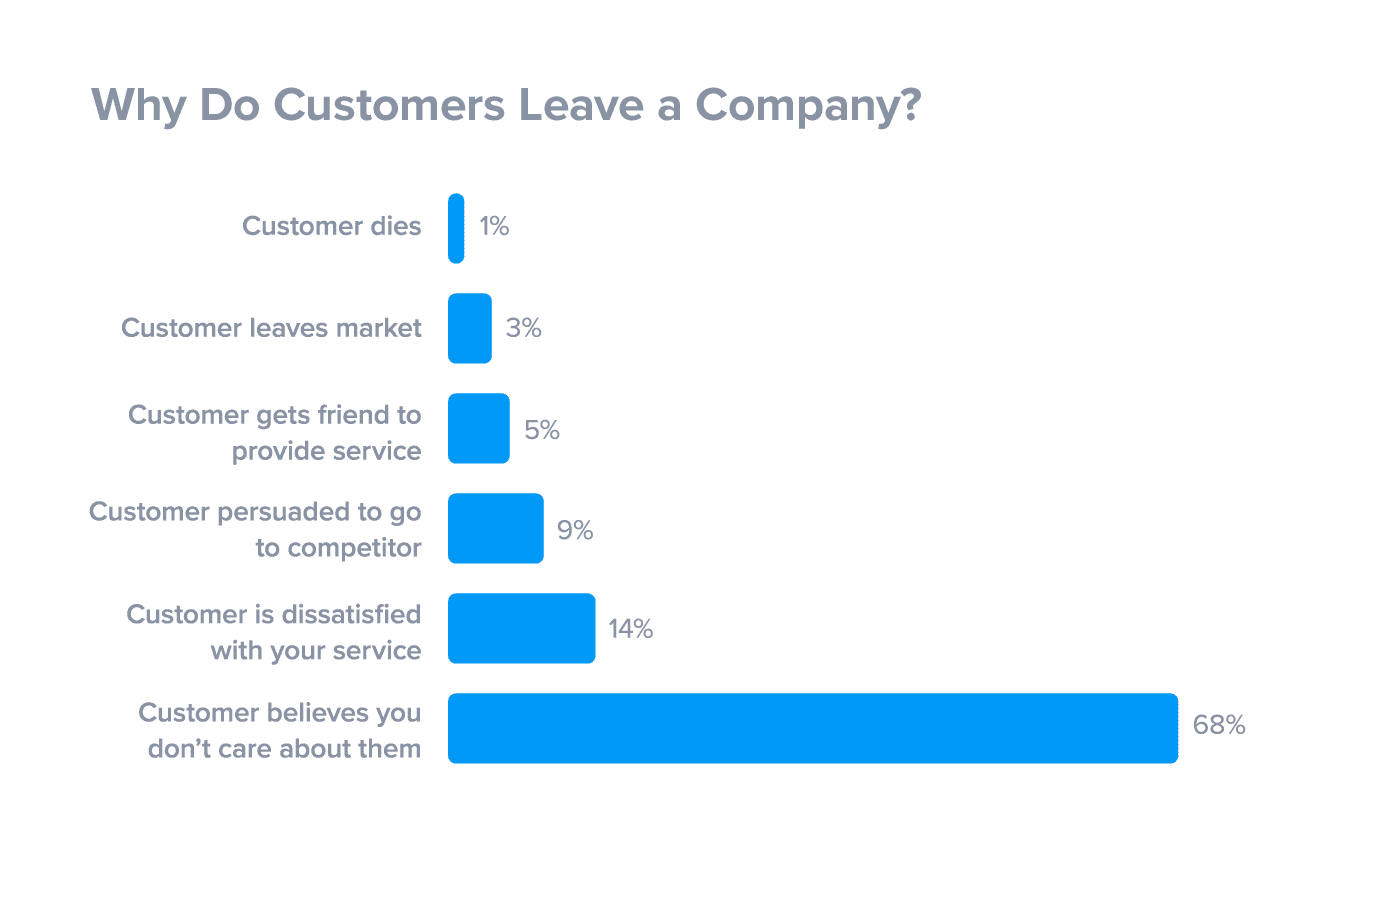 Customer leaving